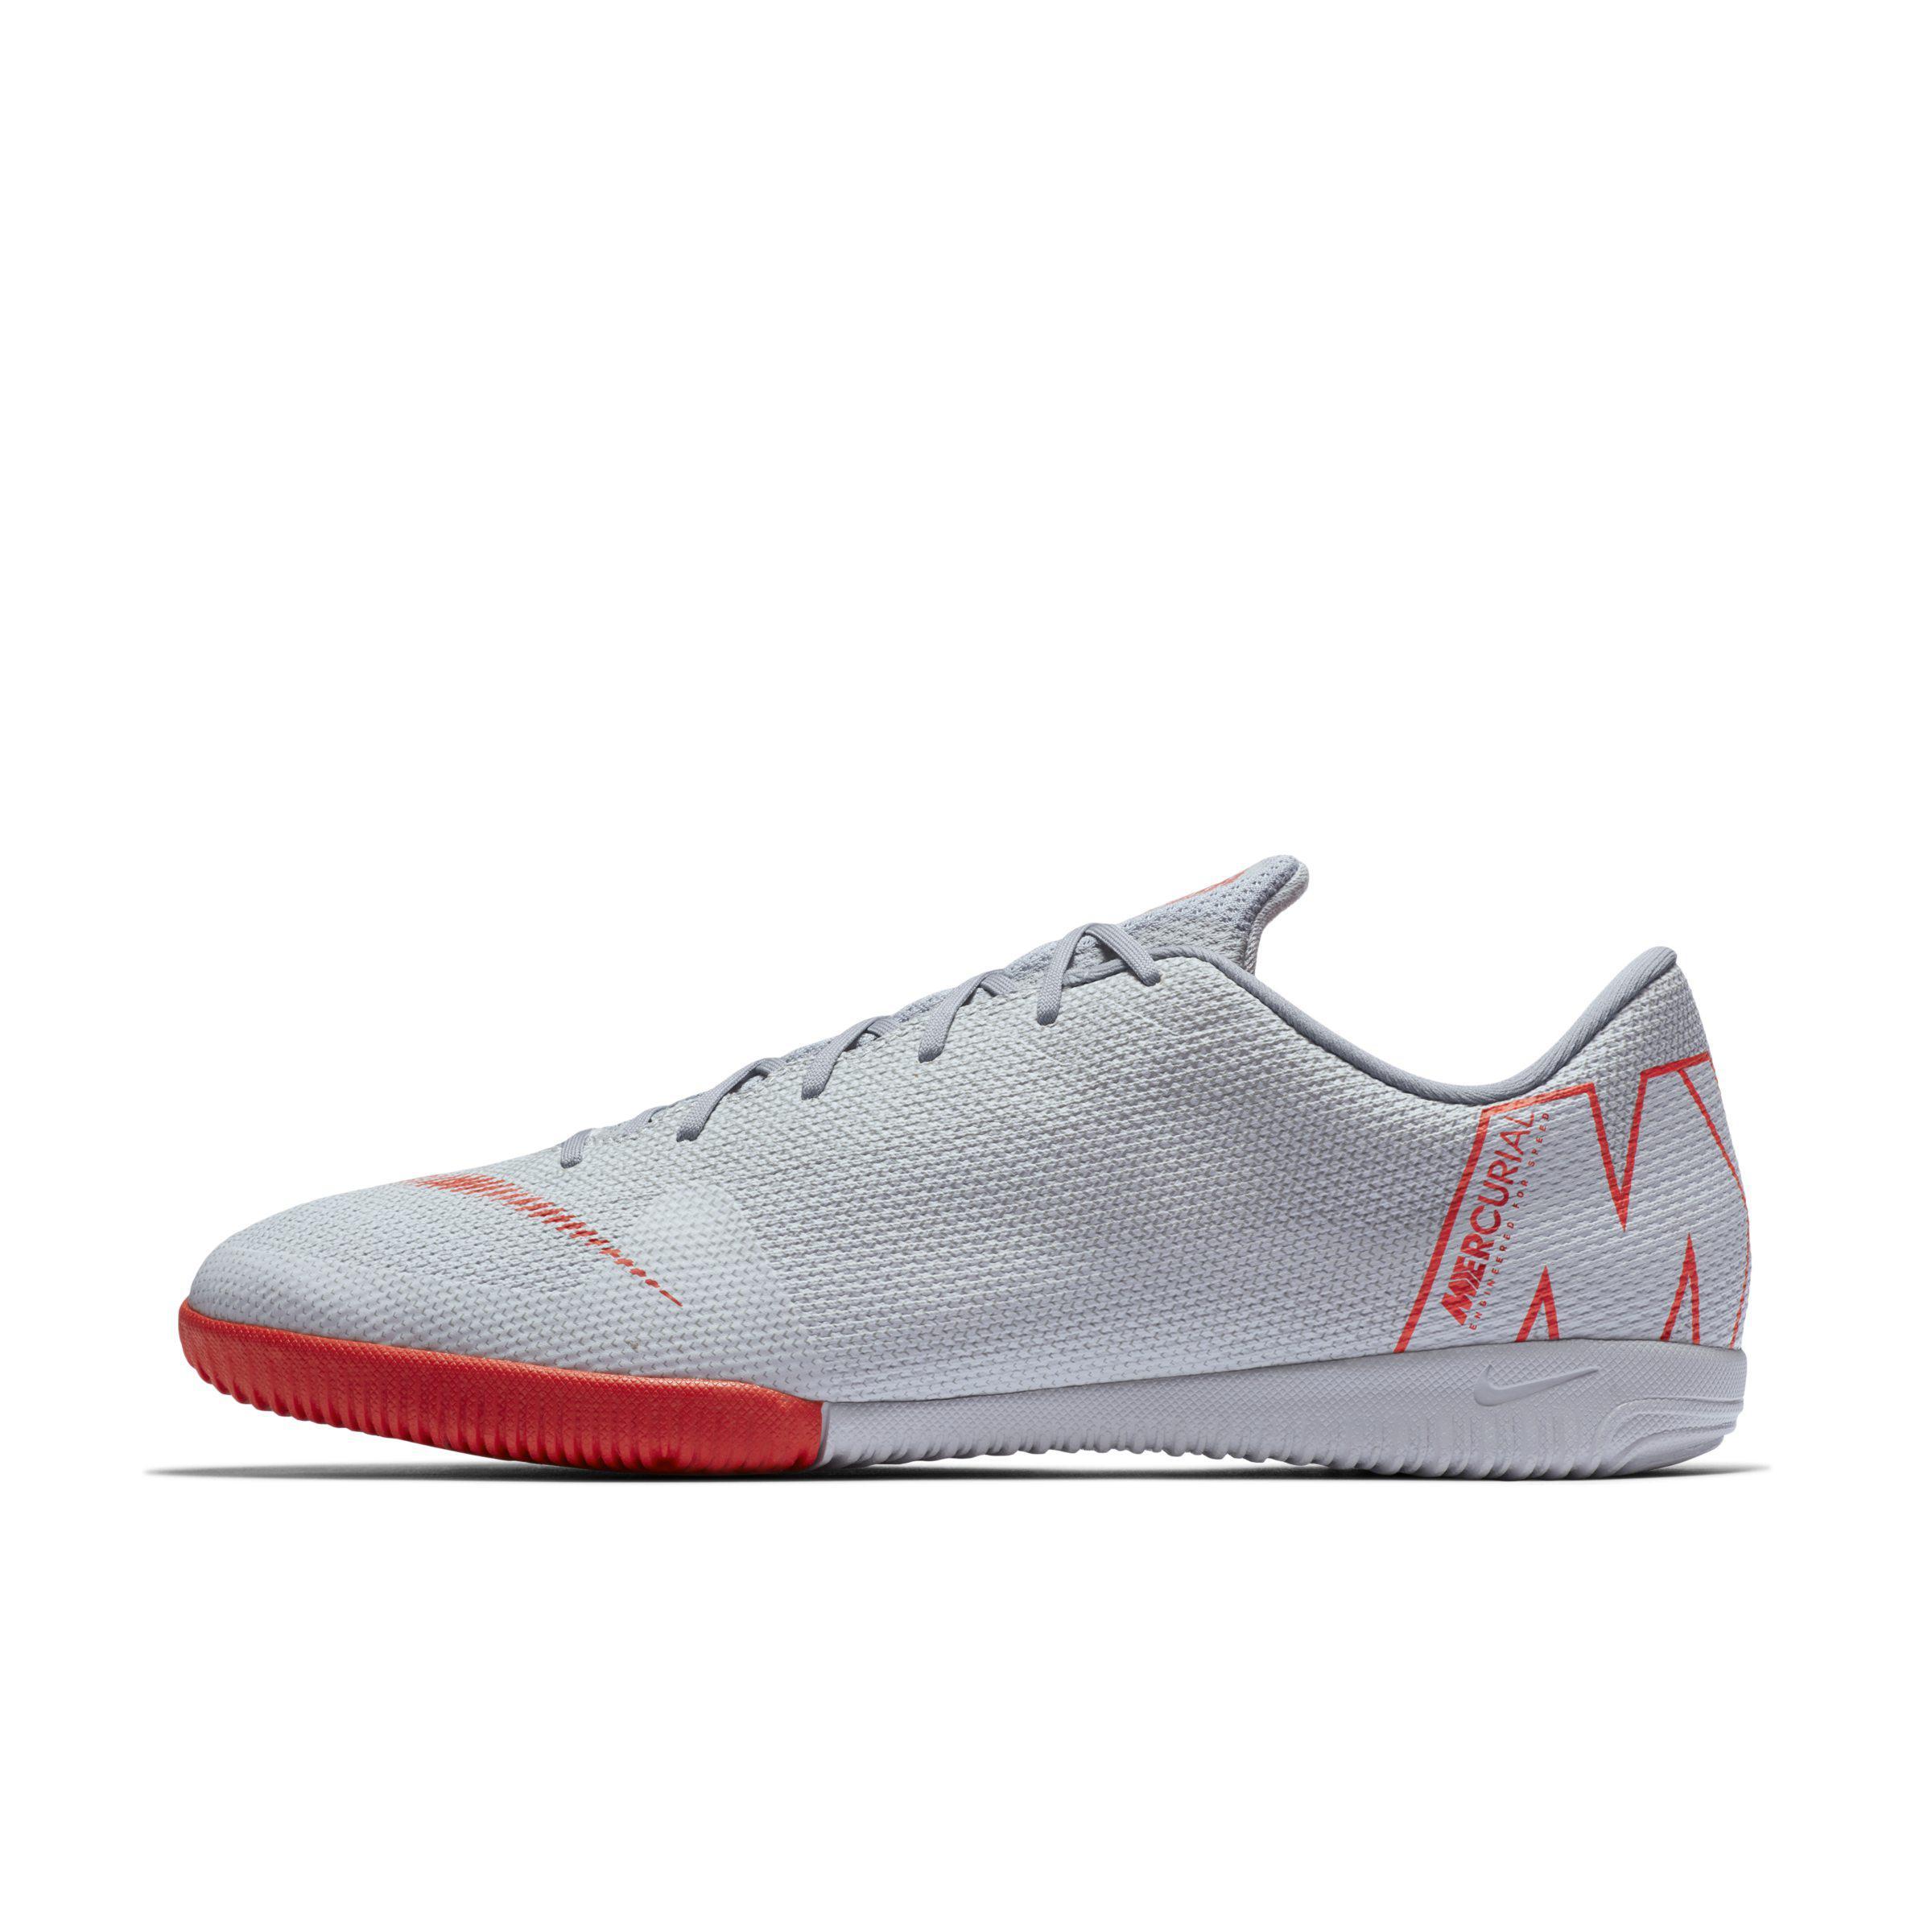 new product 03ba3 85b43 Nike Mercurialx Vapor Xii Academy Indoor/court Football Shoe in Gray ...